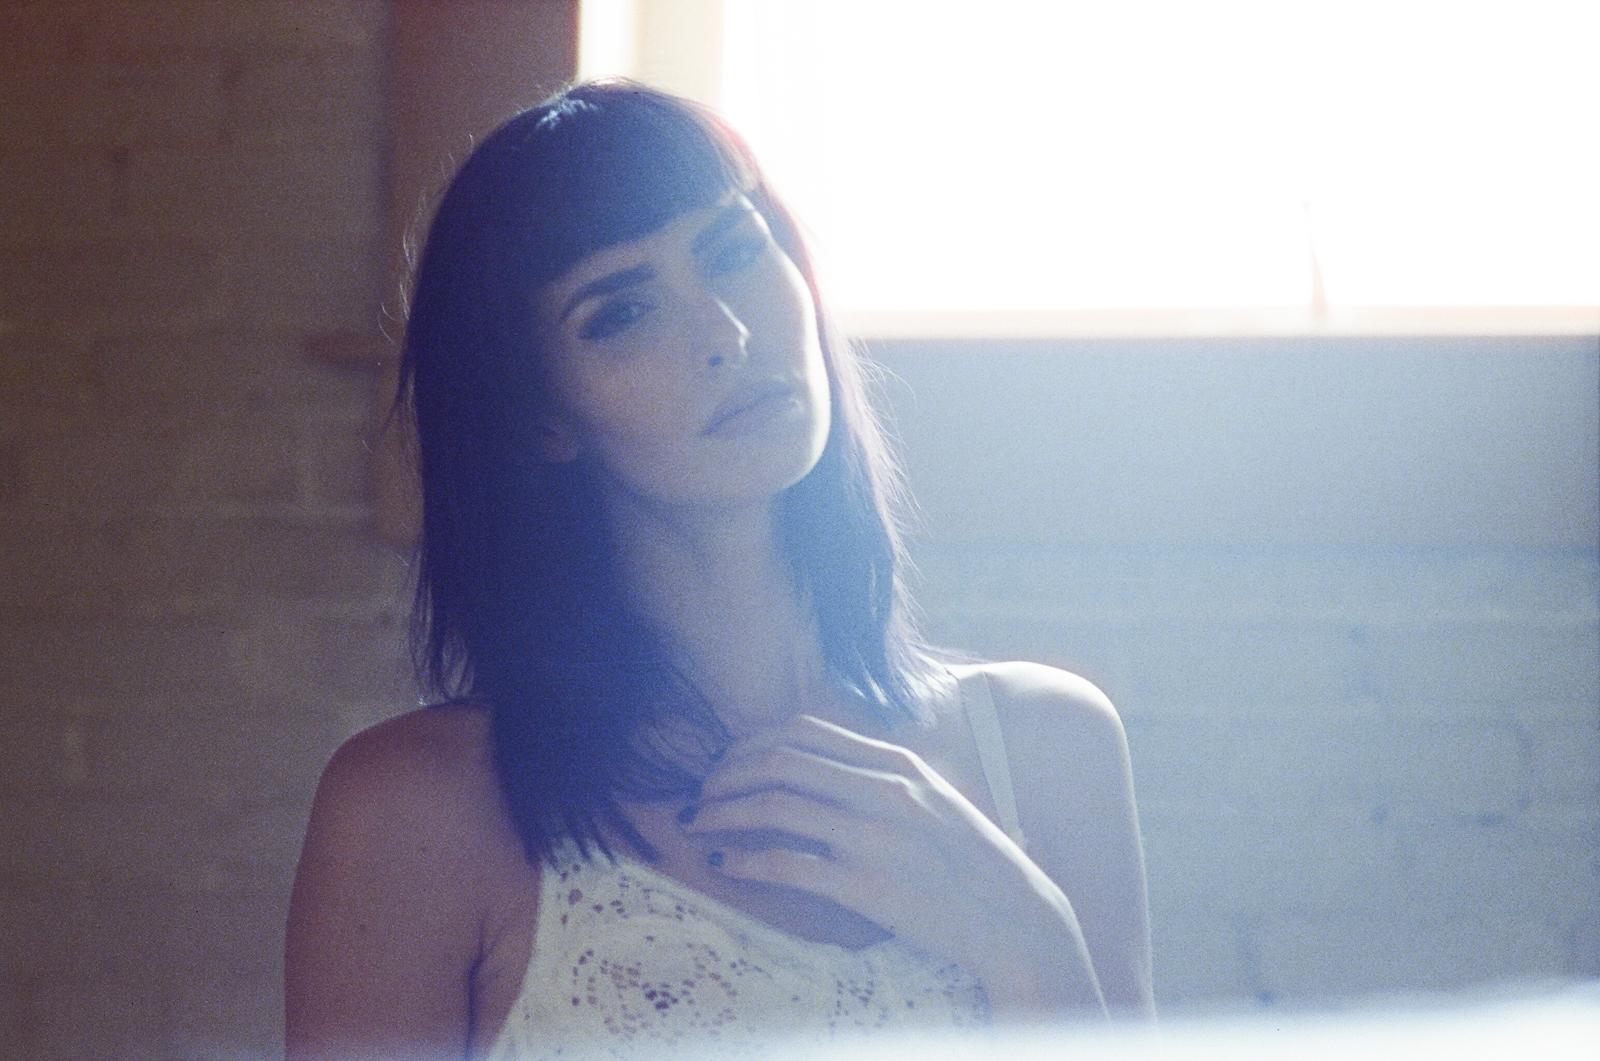 Jillian xenia photography cinestill 800 35mm film